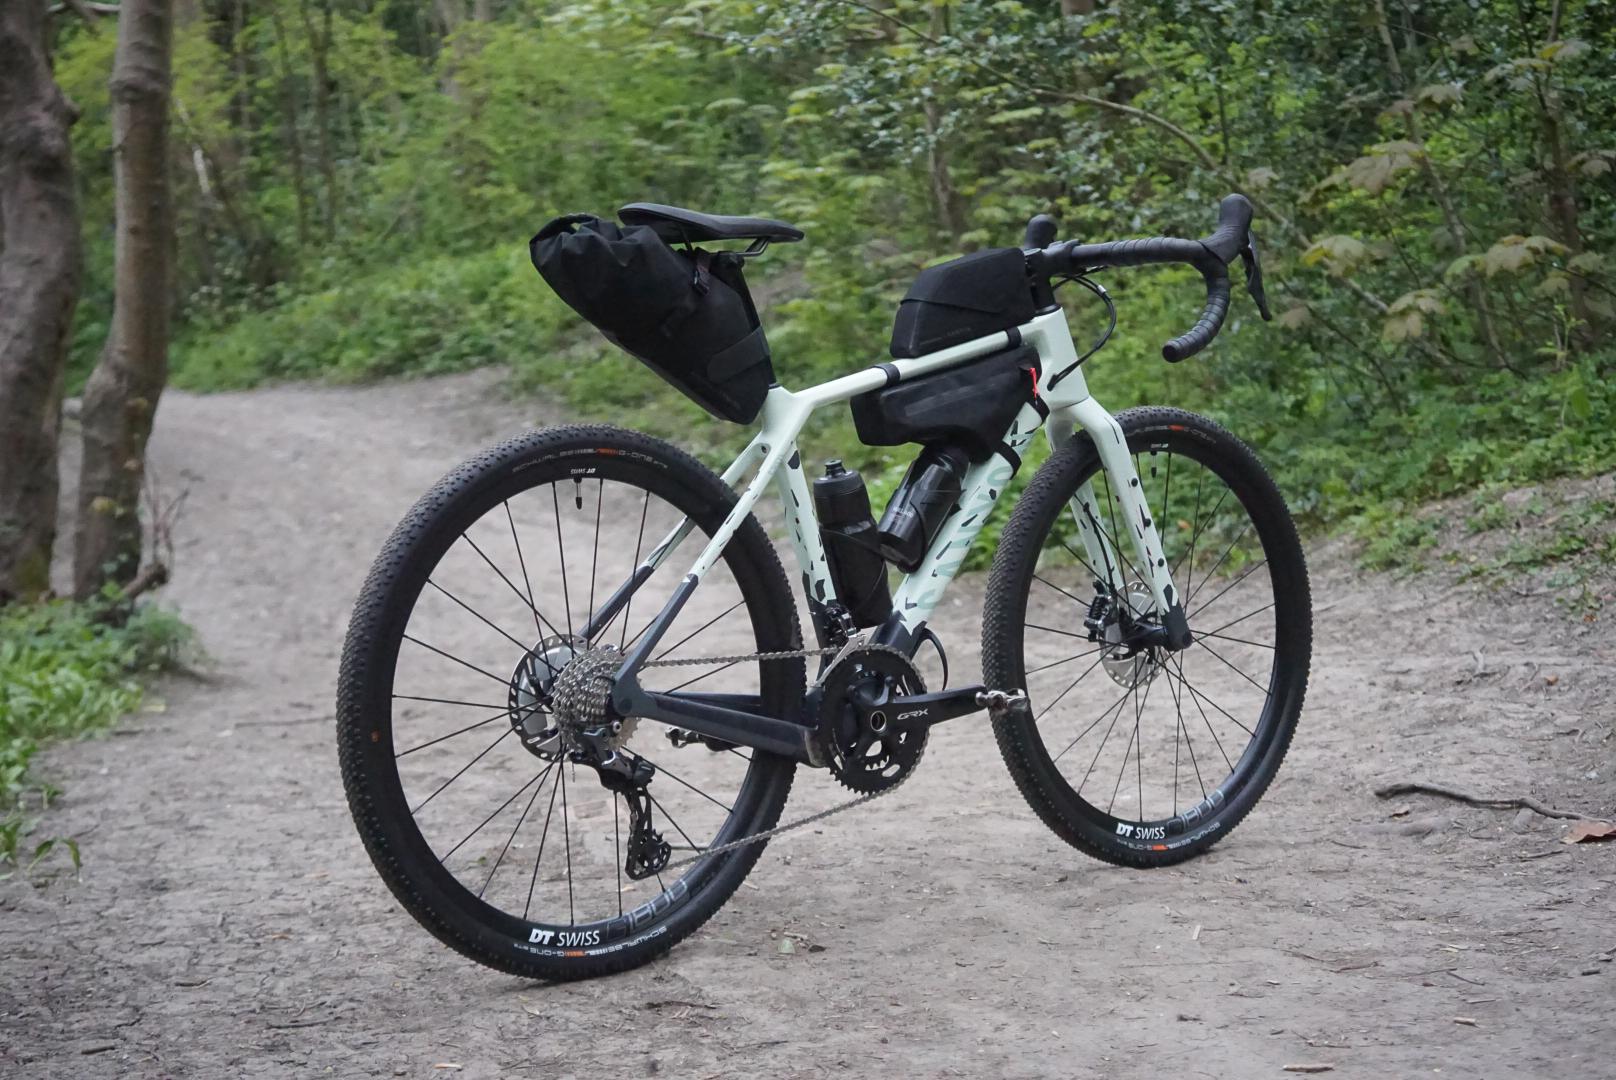 Canyon Grizl new gravel bike